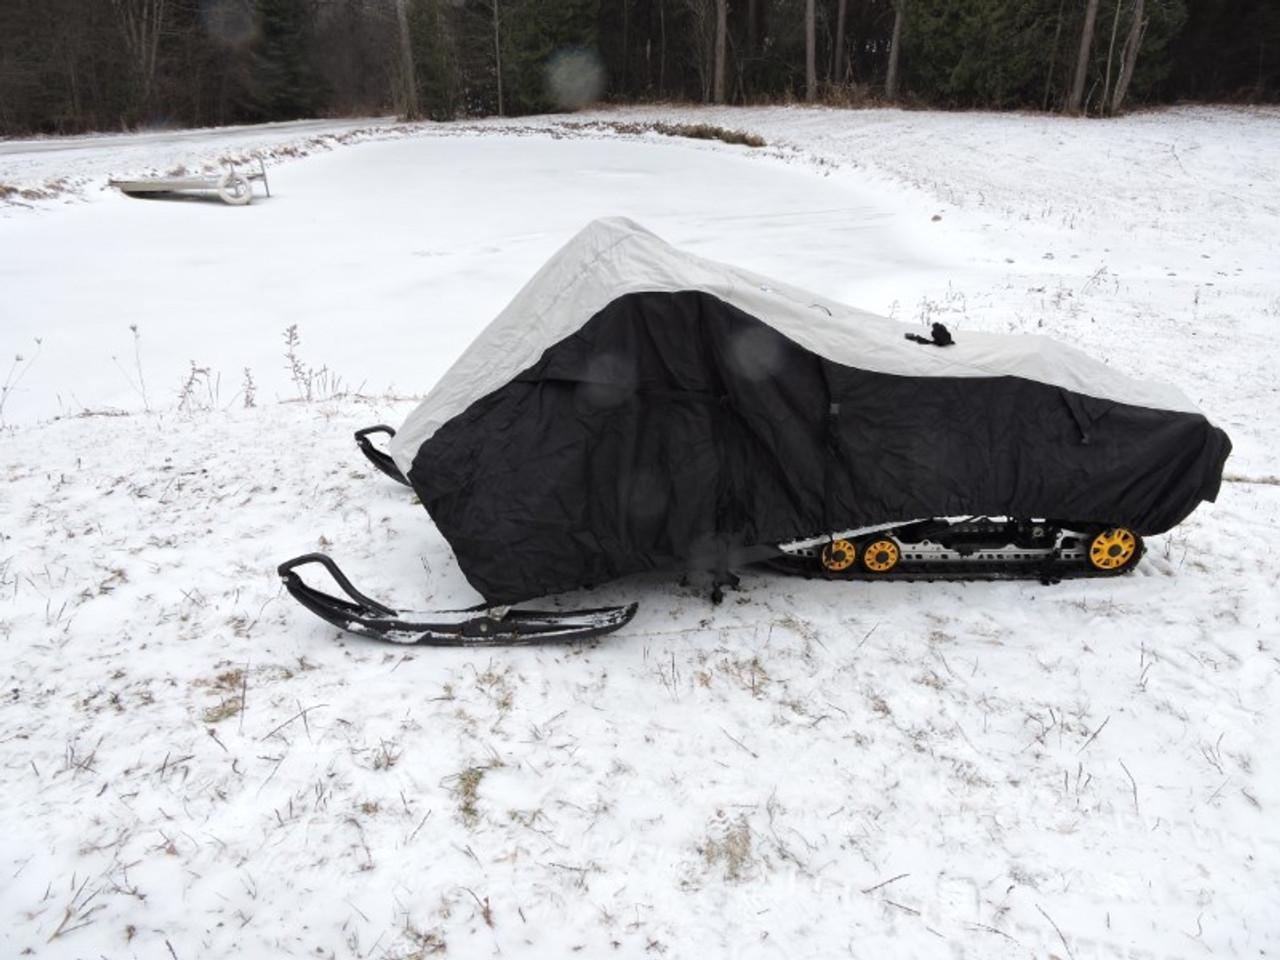 Nanook snowmobile cover side view